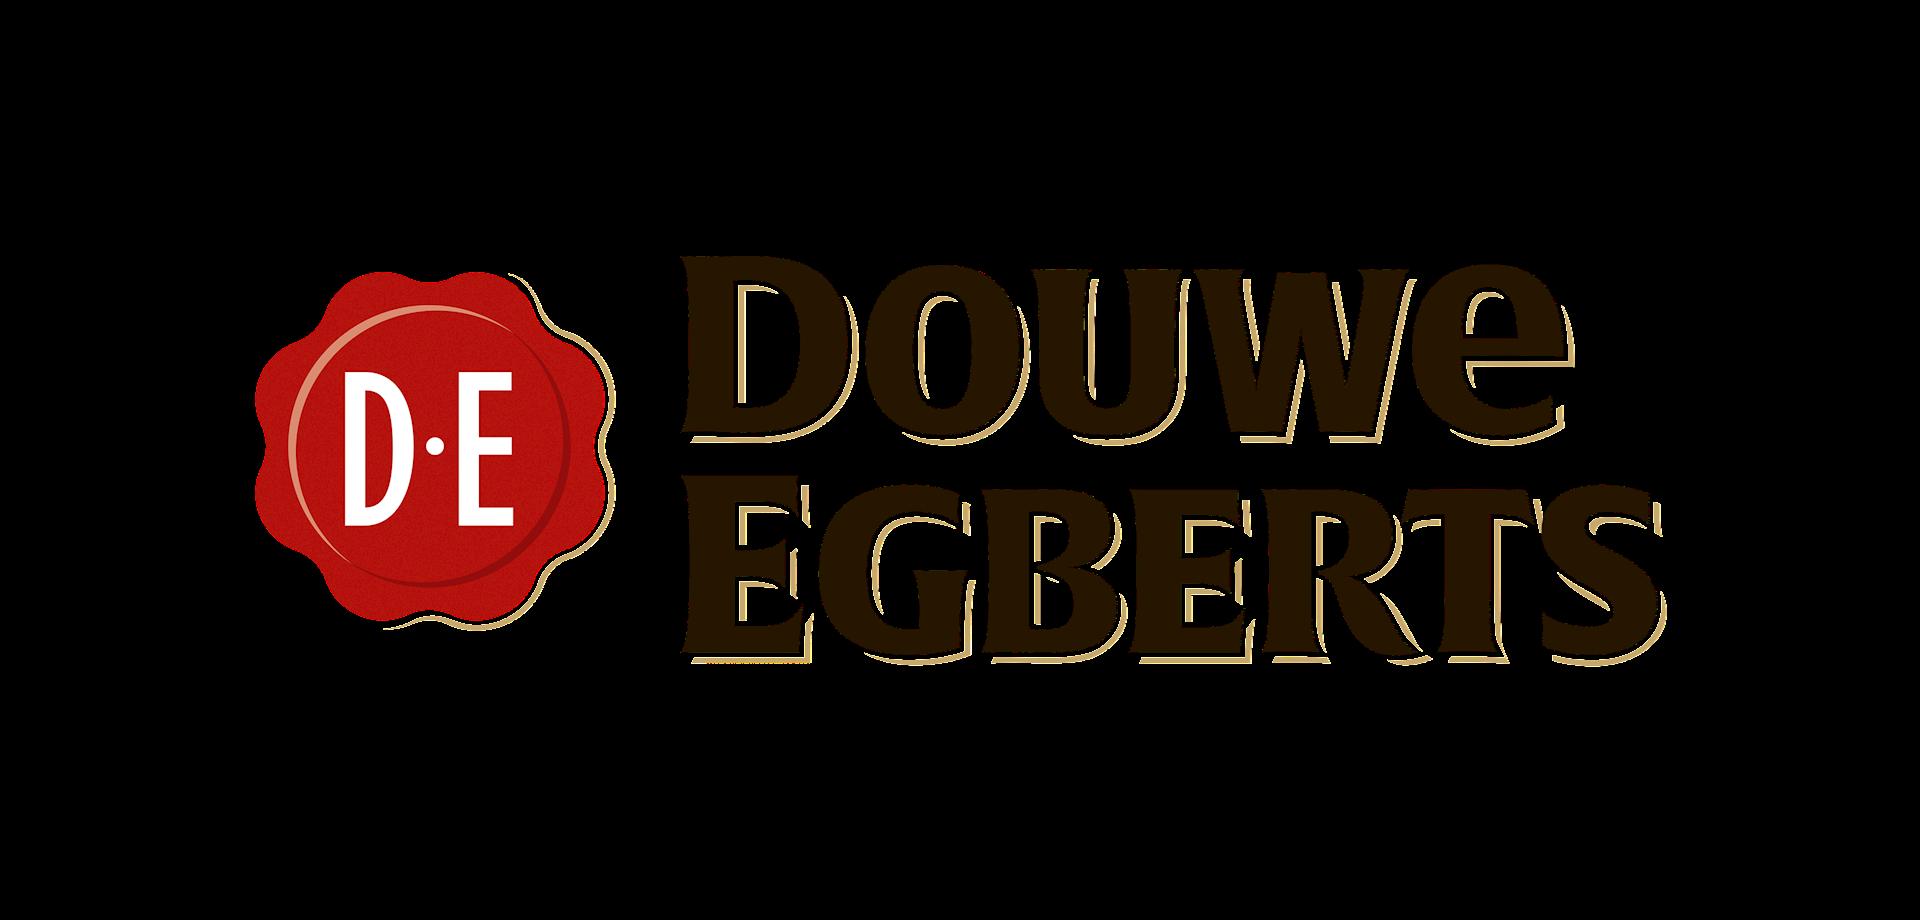 Merkafbeelding DOUWE EGBERTS ESPRESSO